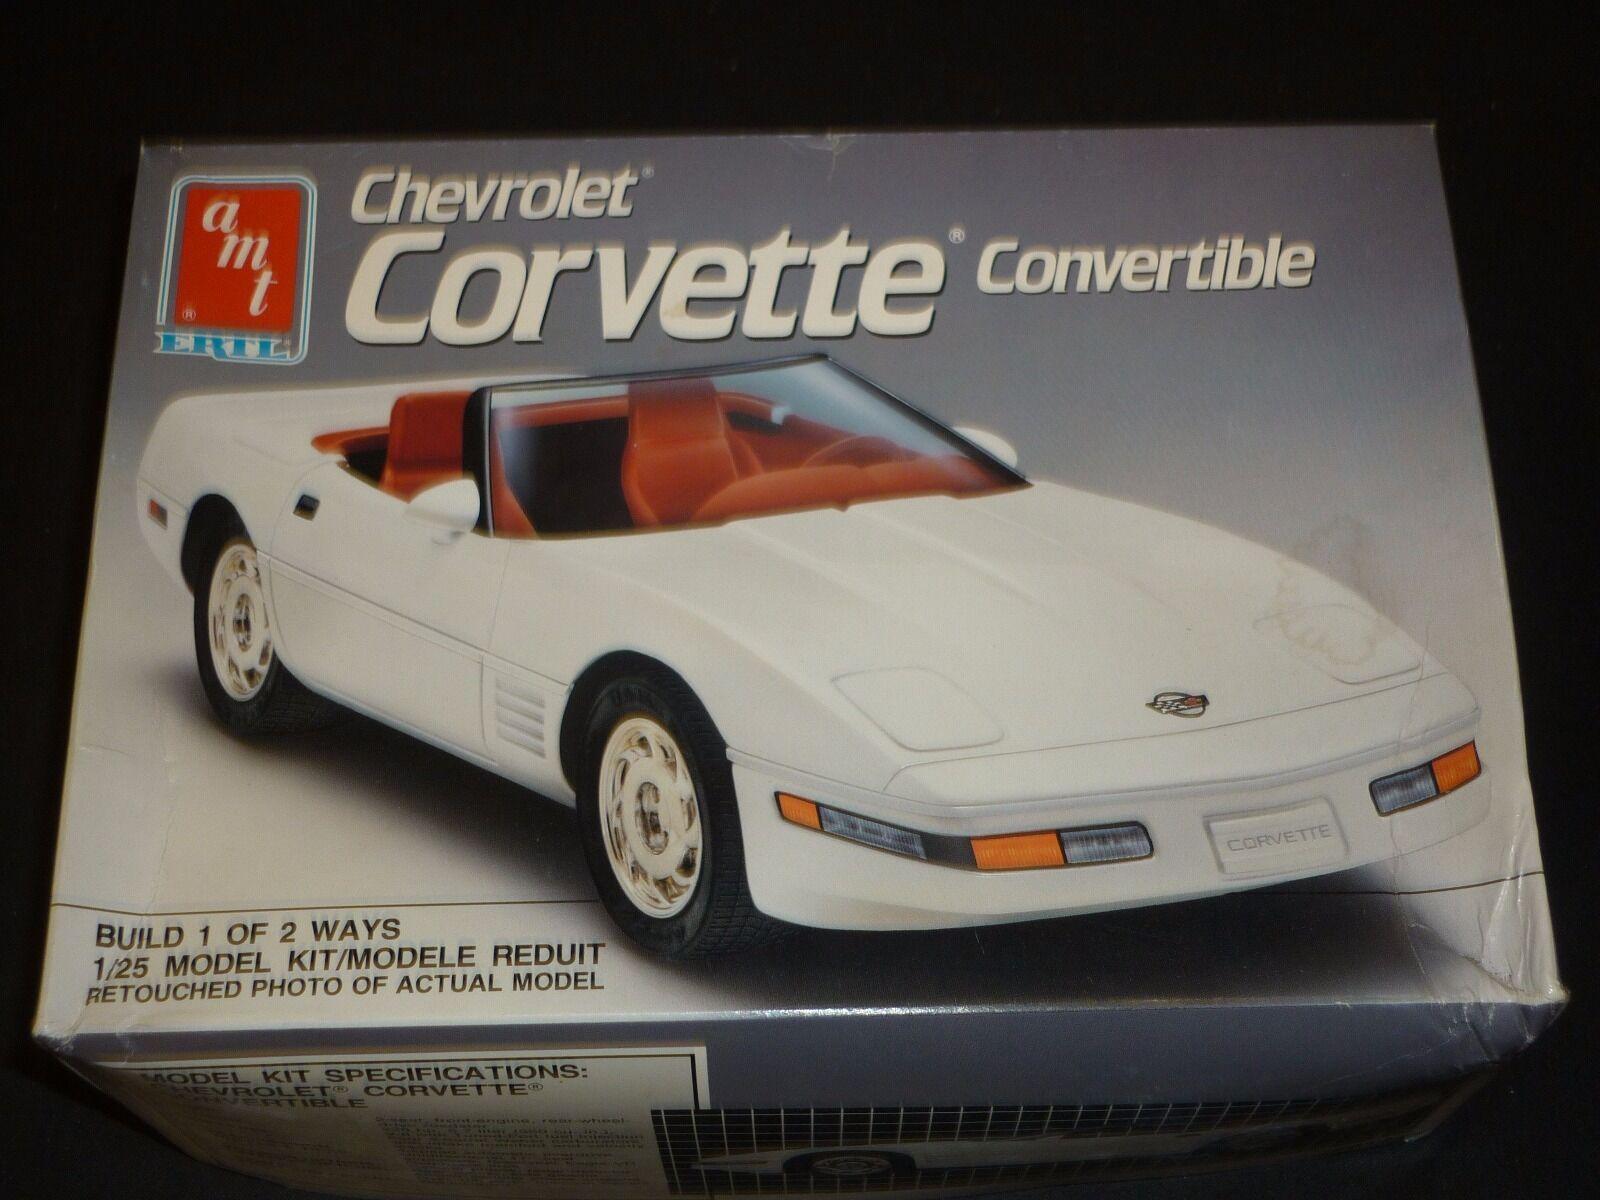 AMT   ERLT un made plastic kit of a Chevrolet corvette congreenible,  boxed